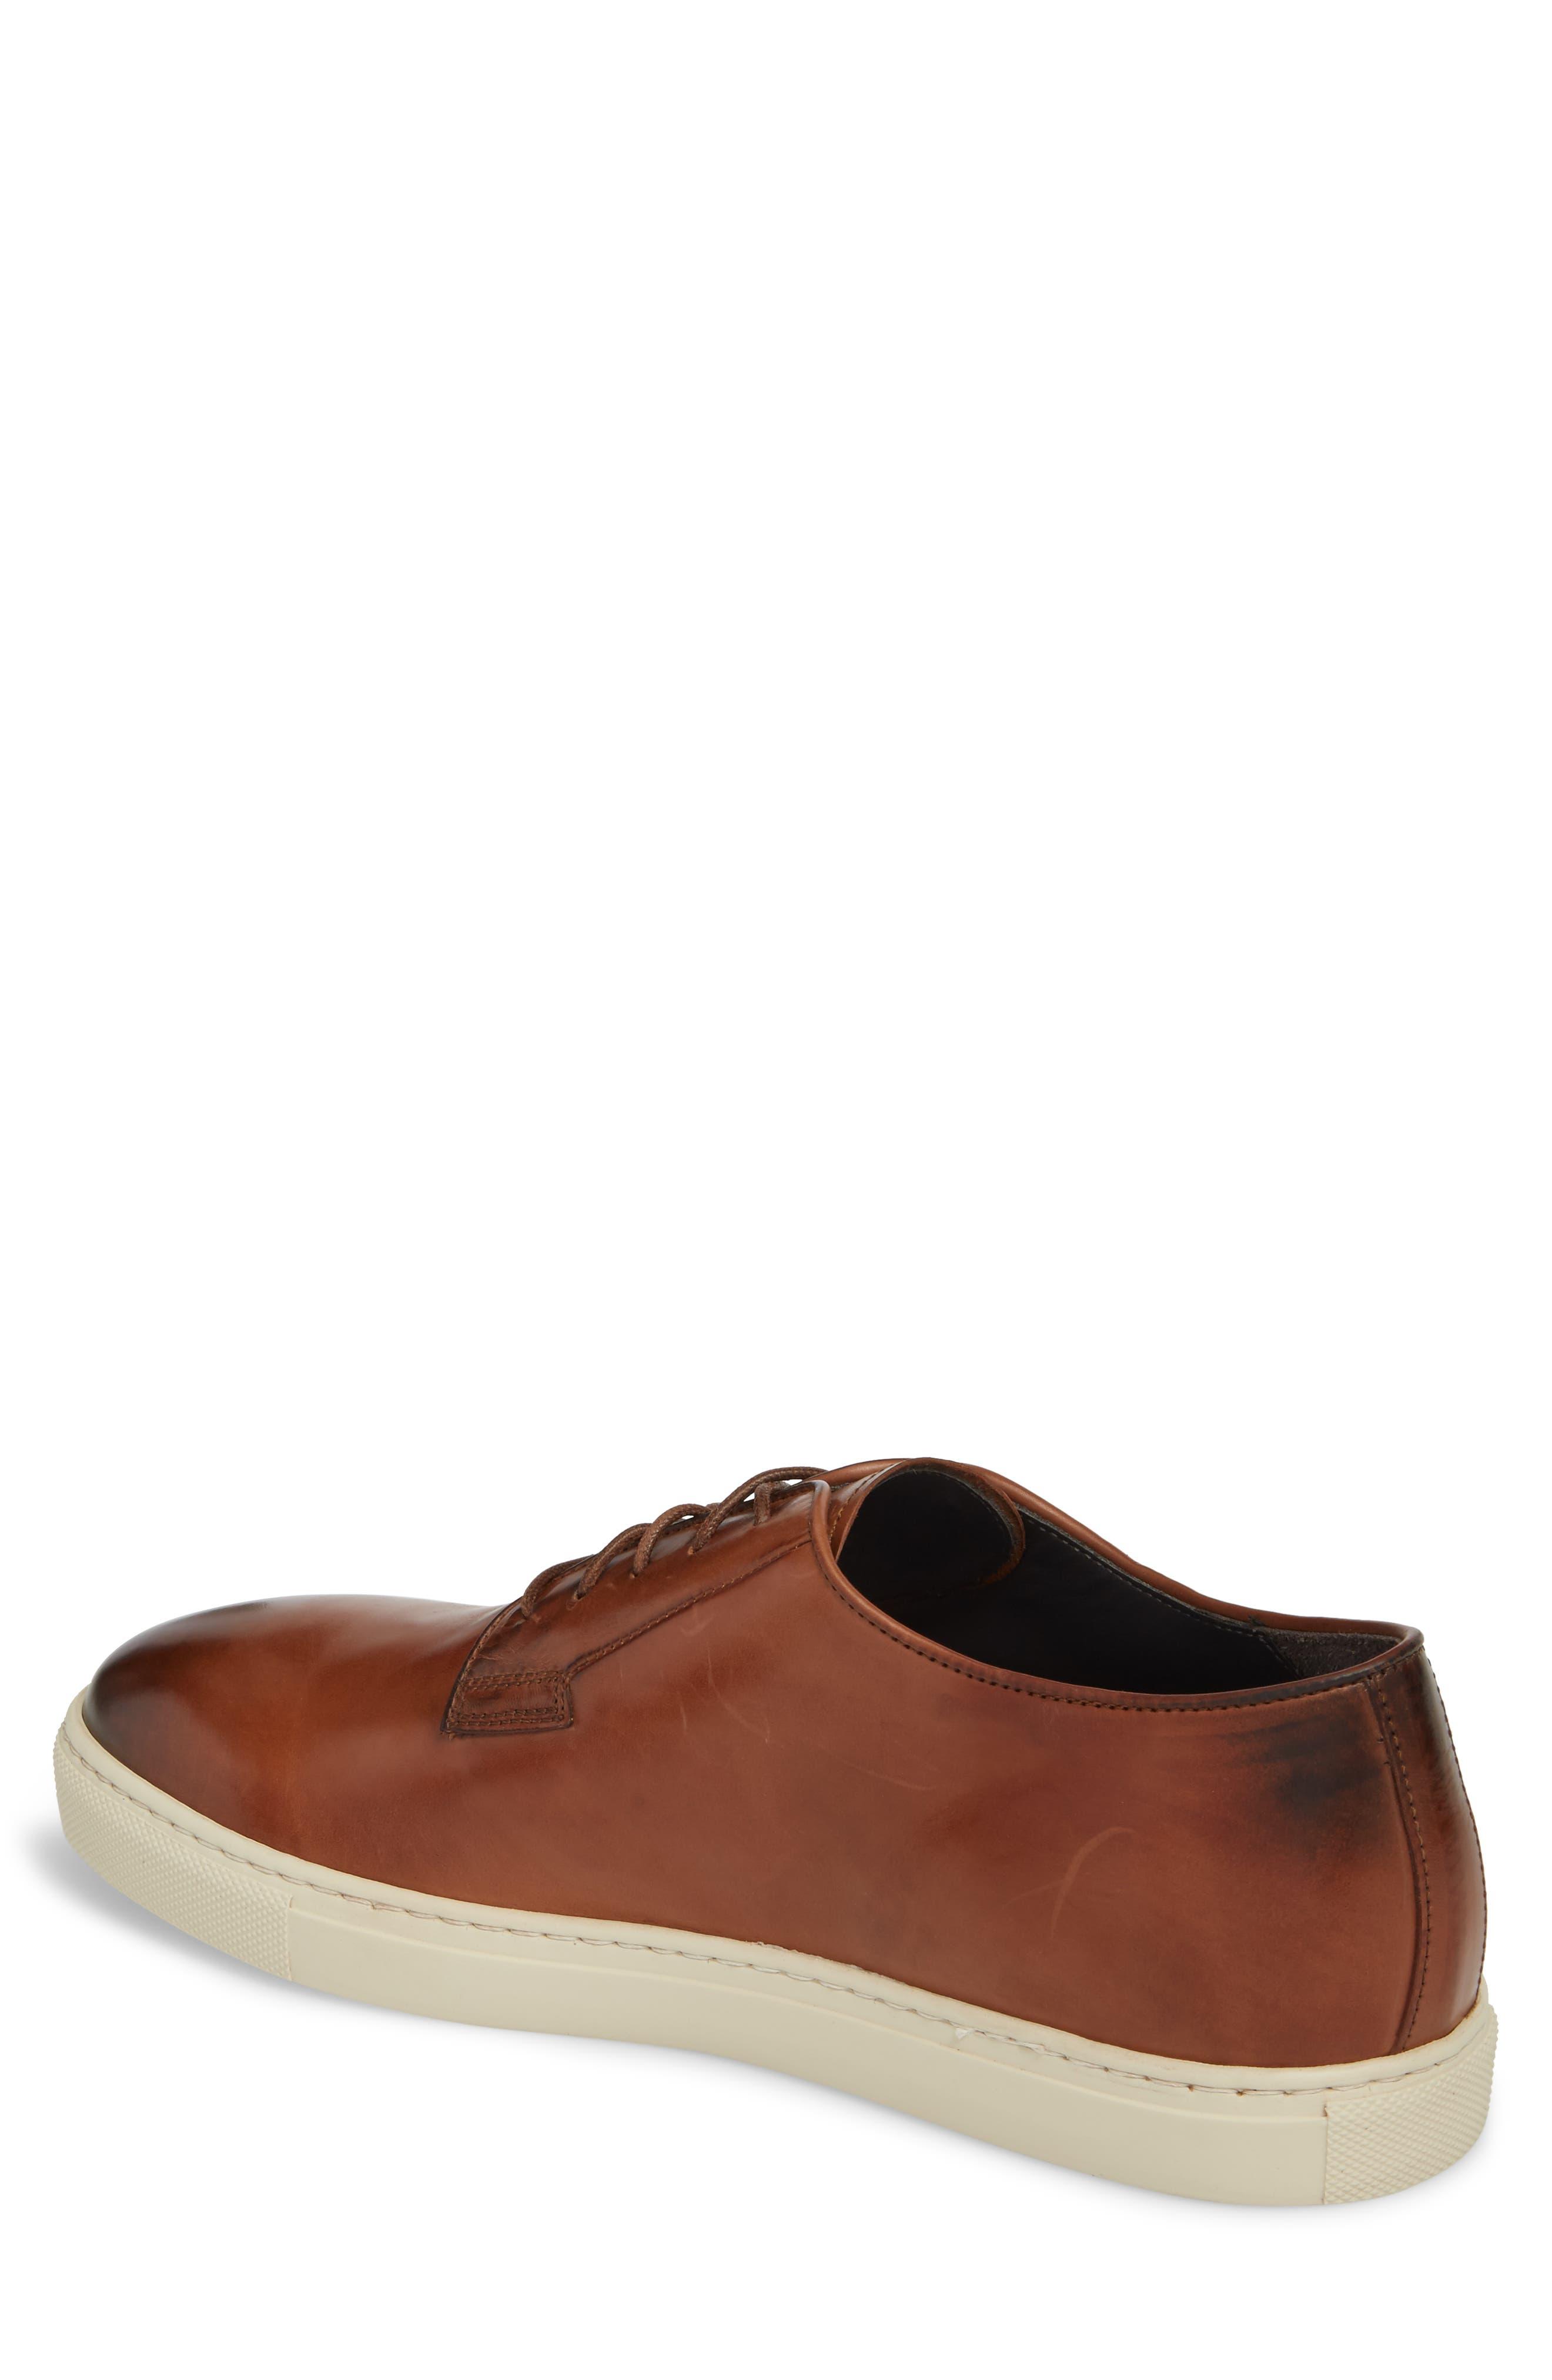 Plain Toe Derby Sneaker,                             Alternate thumbnail 2, color,                             DIVER TAN LEATHER